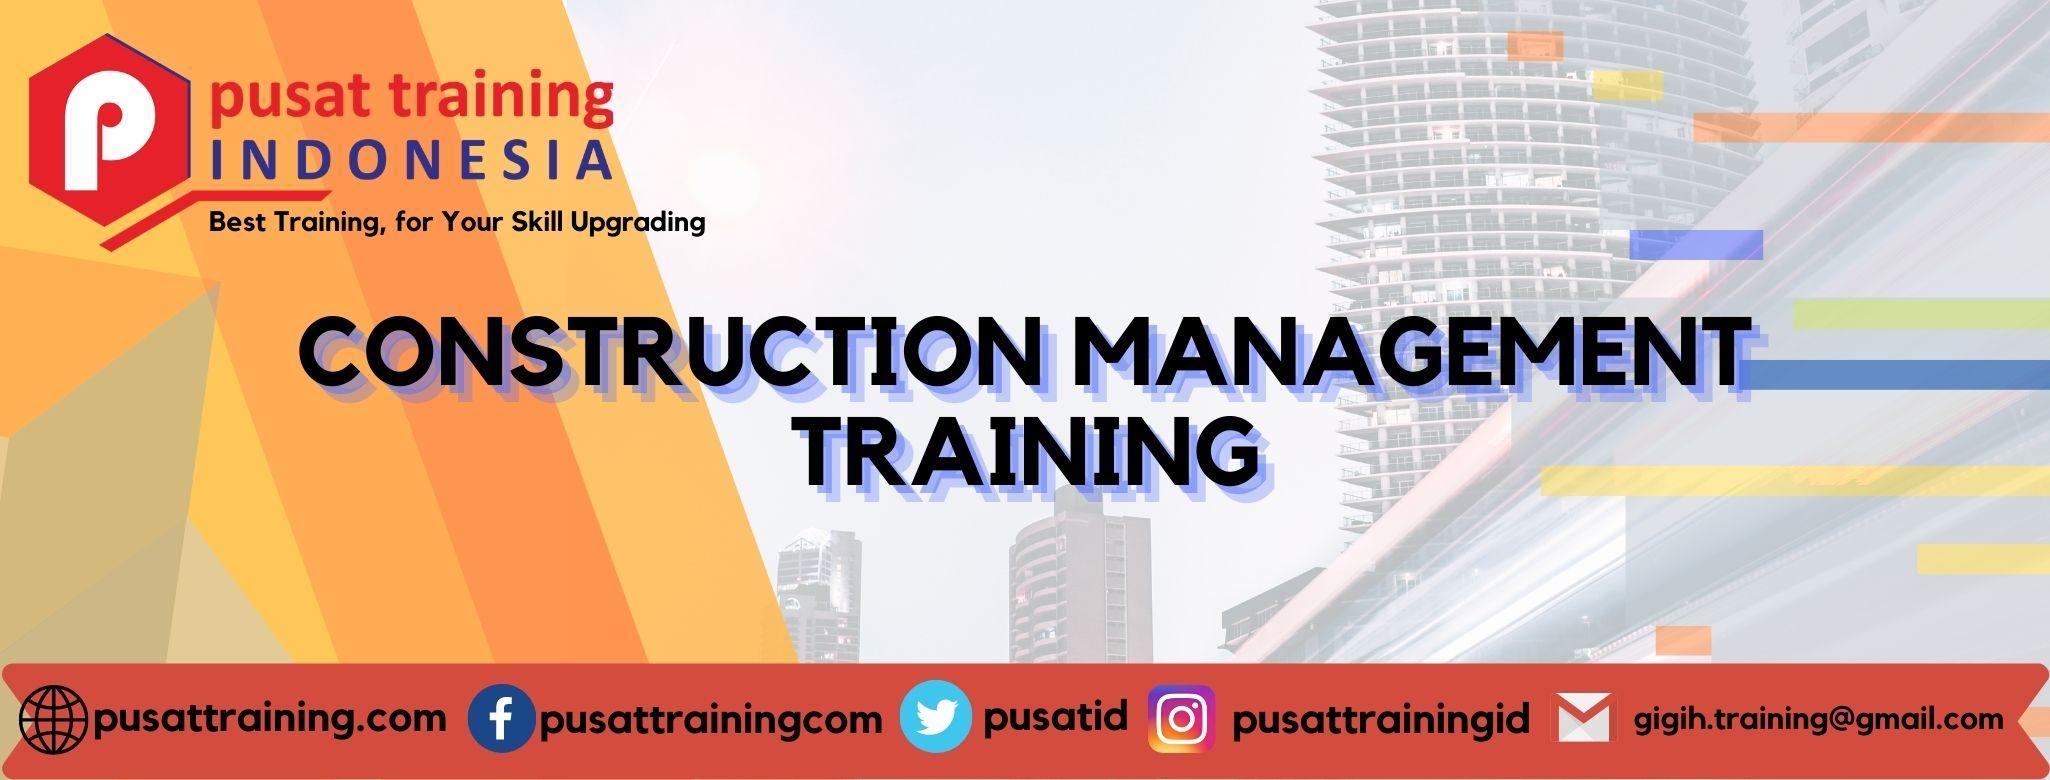 CONSTRUCTION MANAGEMENT TRAINING